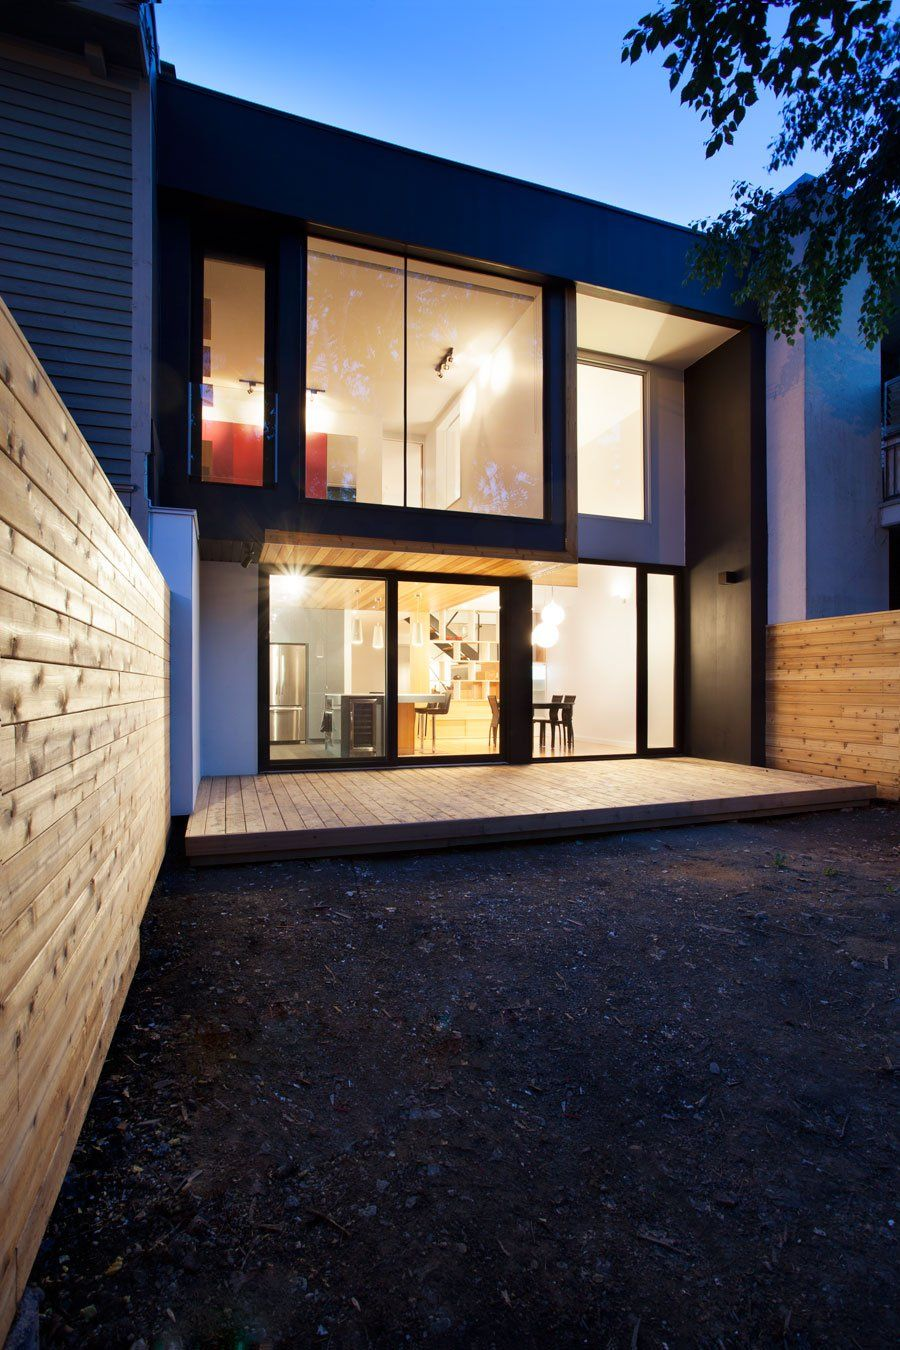 Home design chambord residence by naturehumaine also paco ramirez pacoramrez on pinterest rh